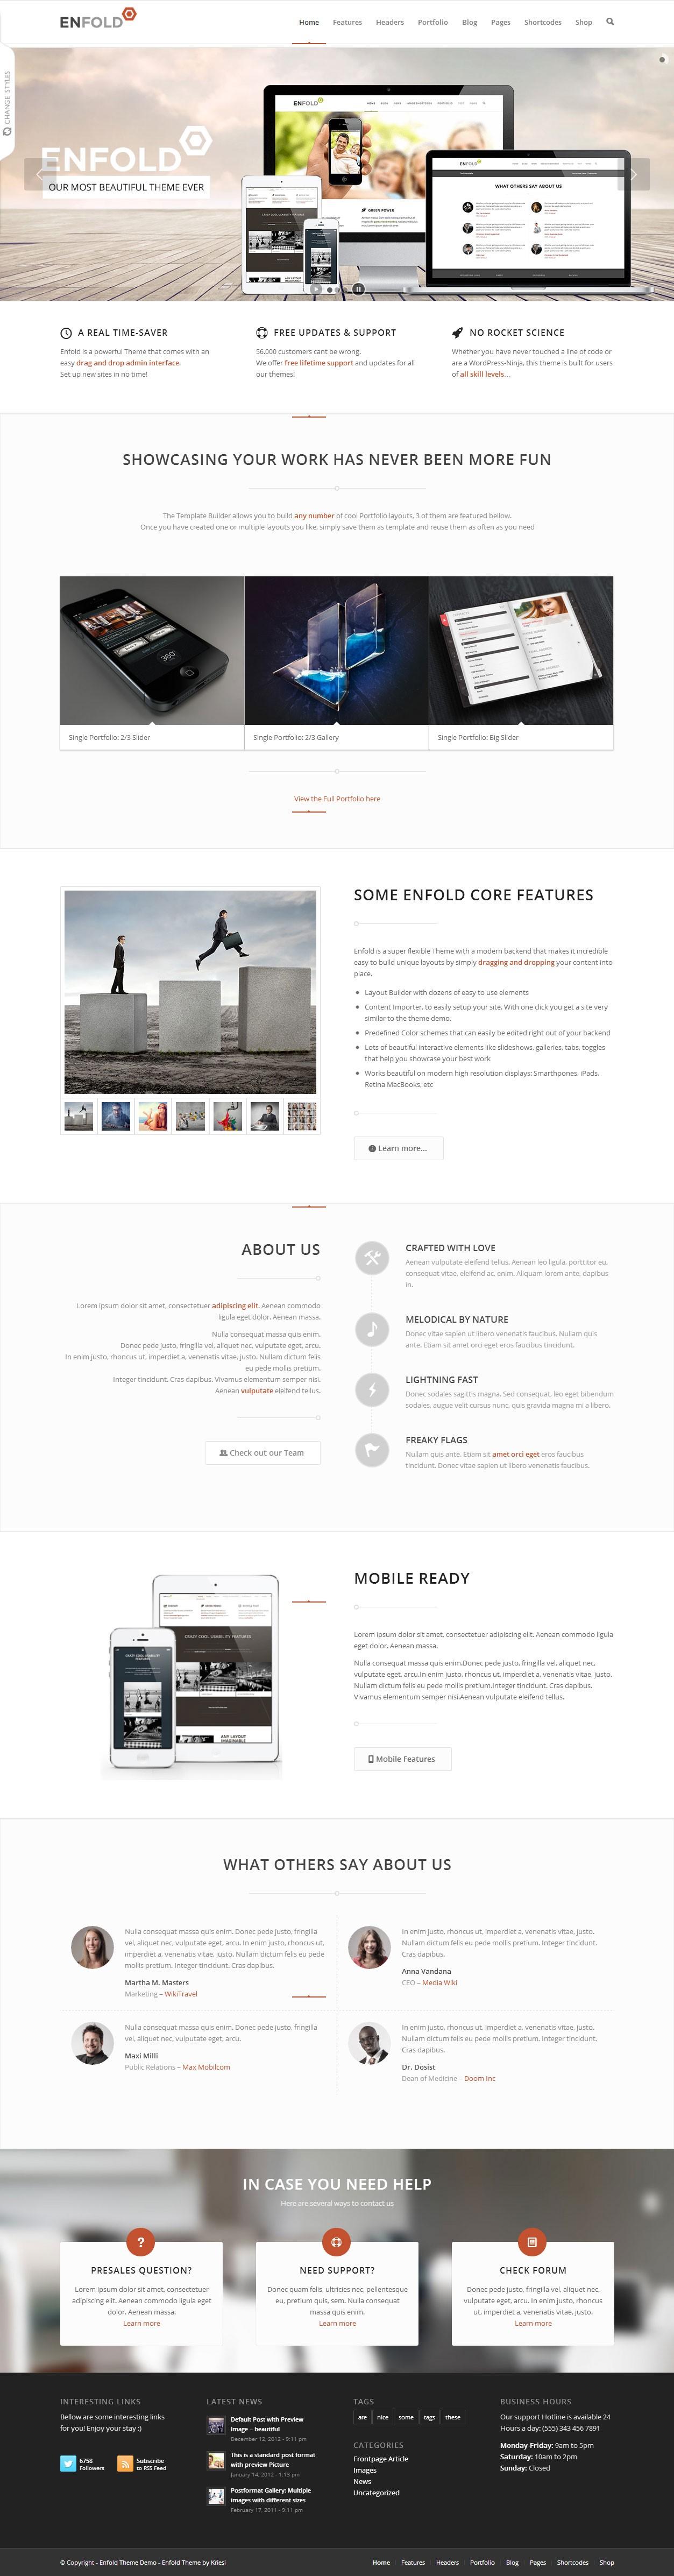 enfold-multipurpose-wordpress-theme-1